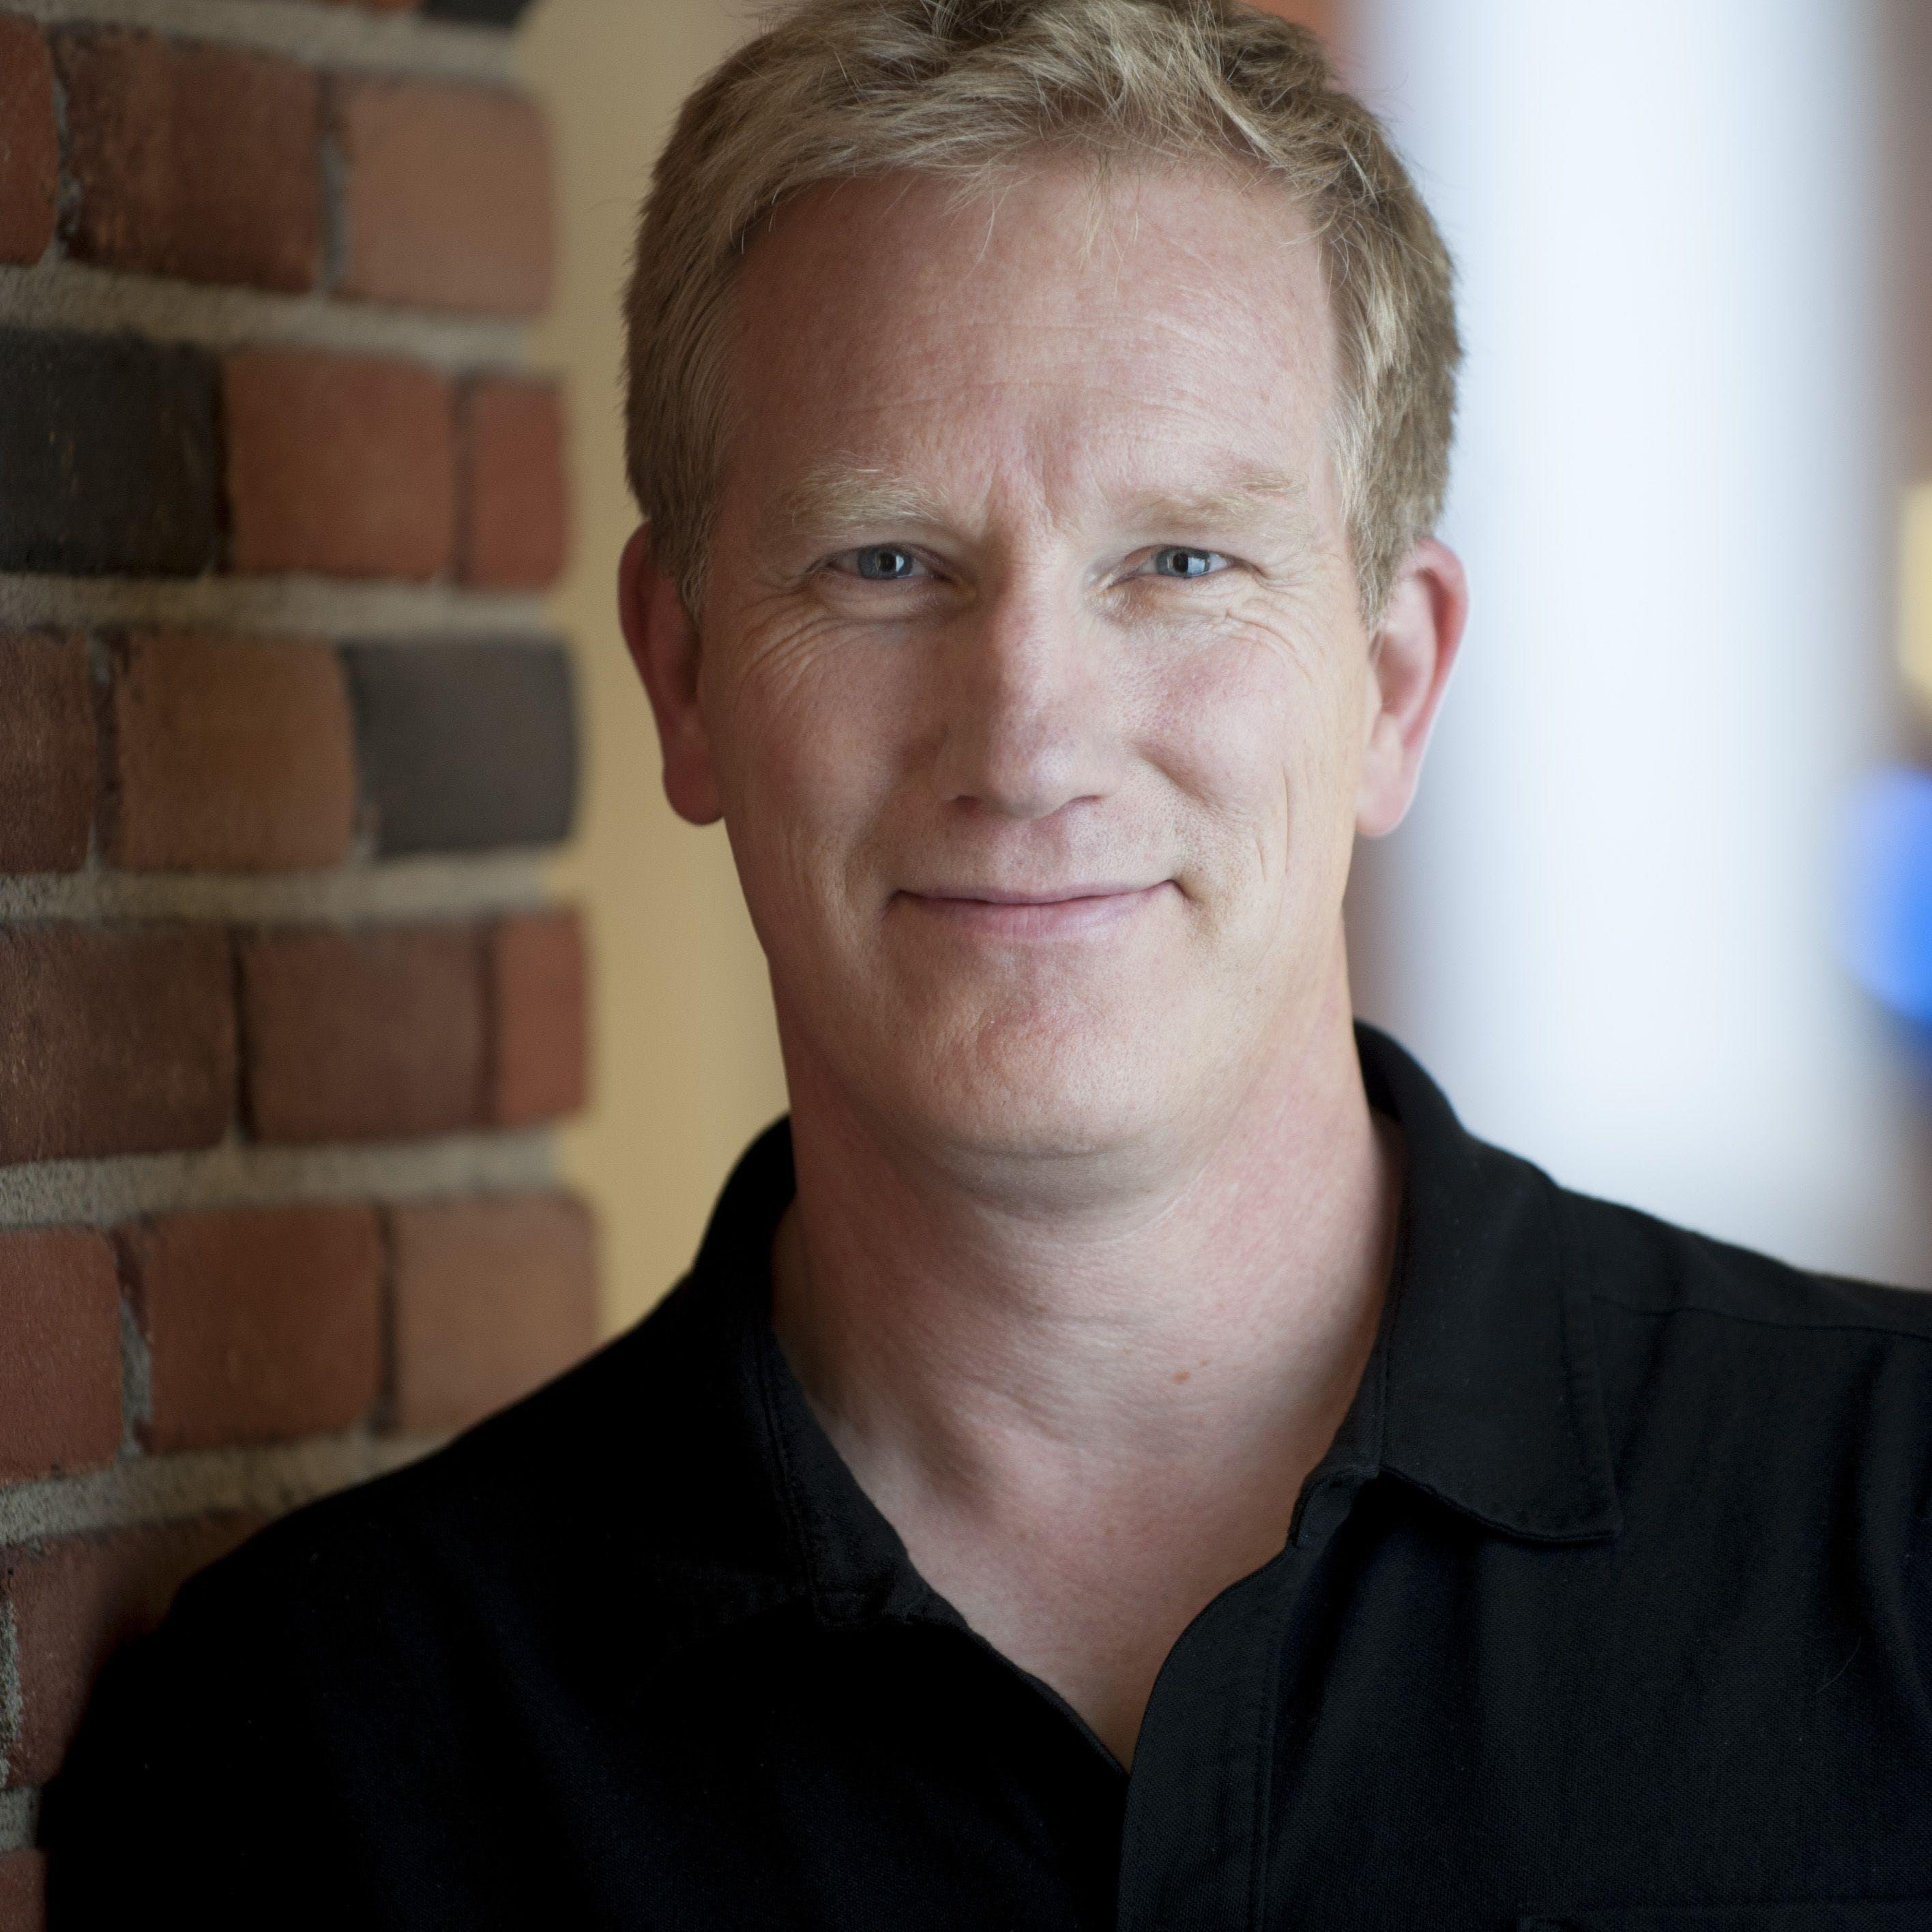 Joel Frederickson